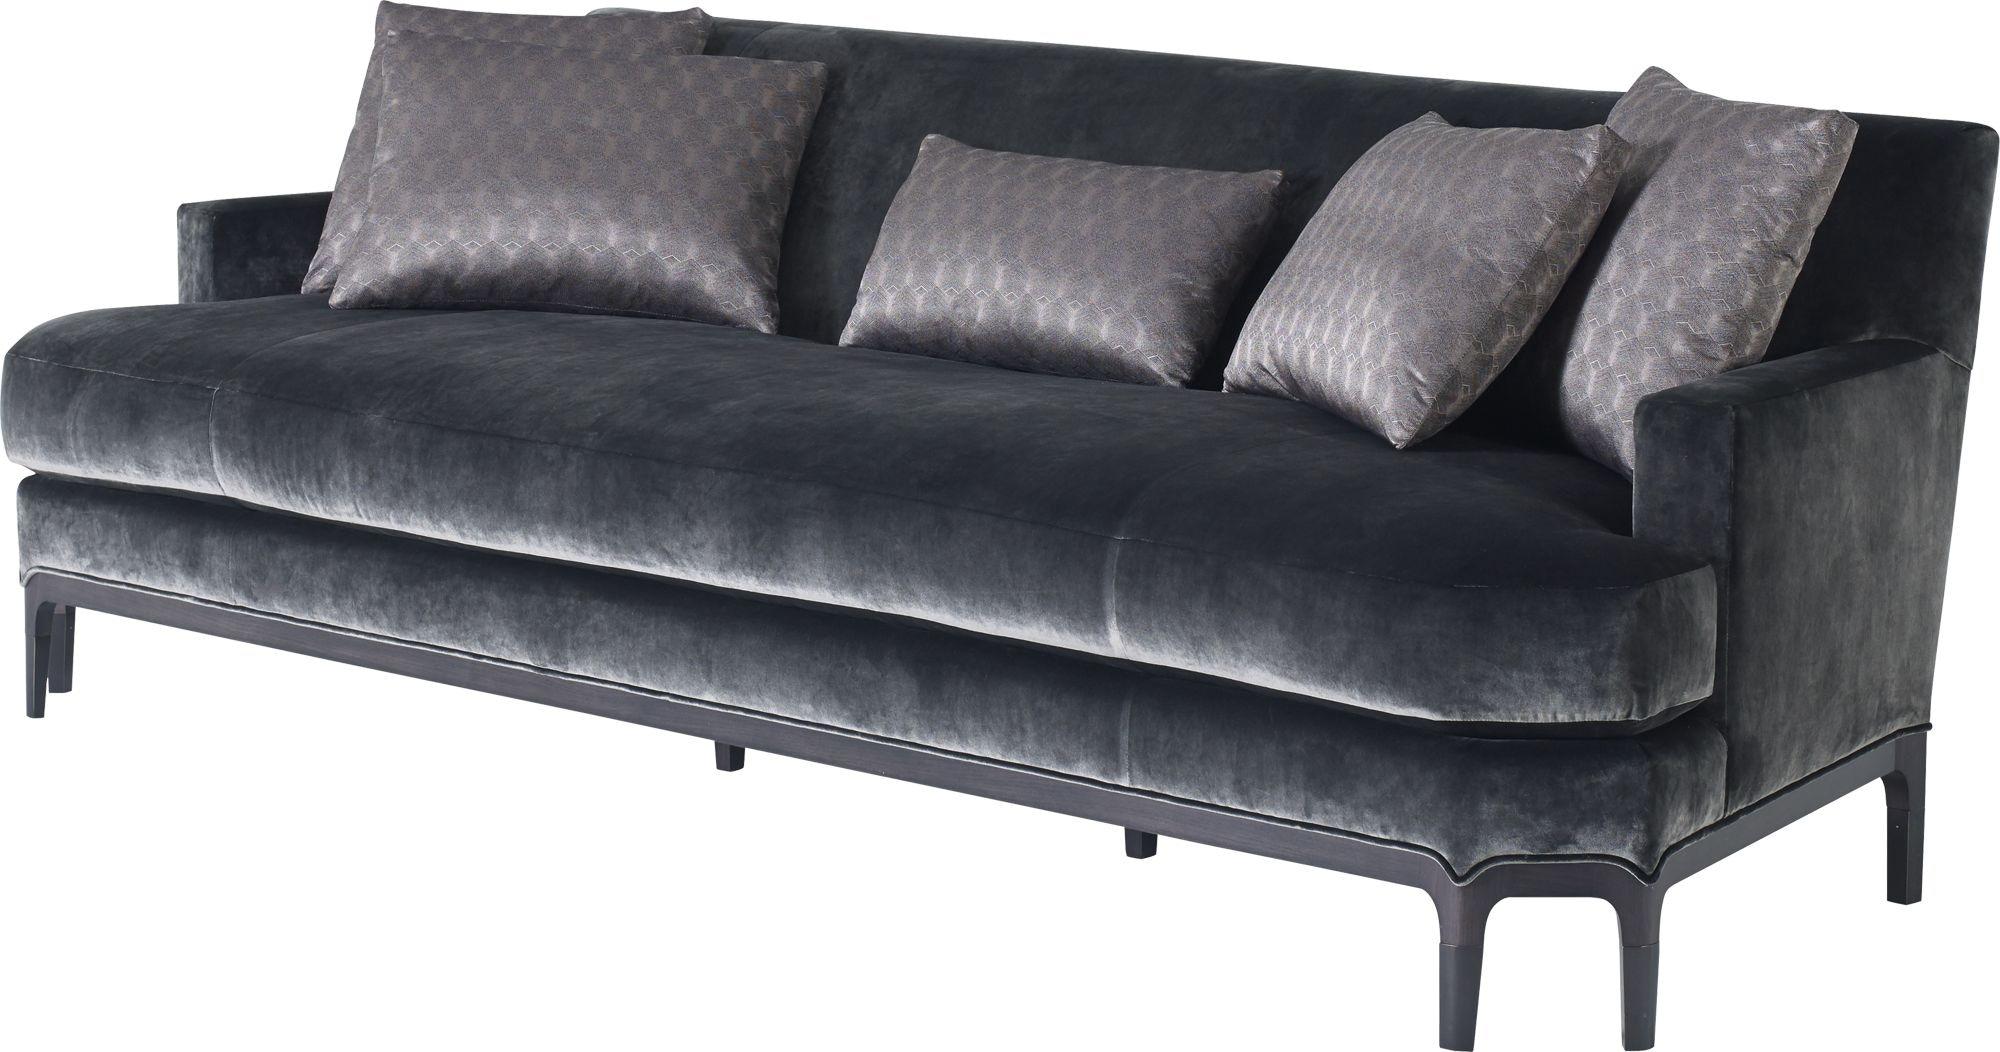 Baker Furniture Jean Louis Deniot Celestite Sofa 6179S